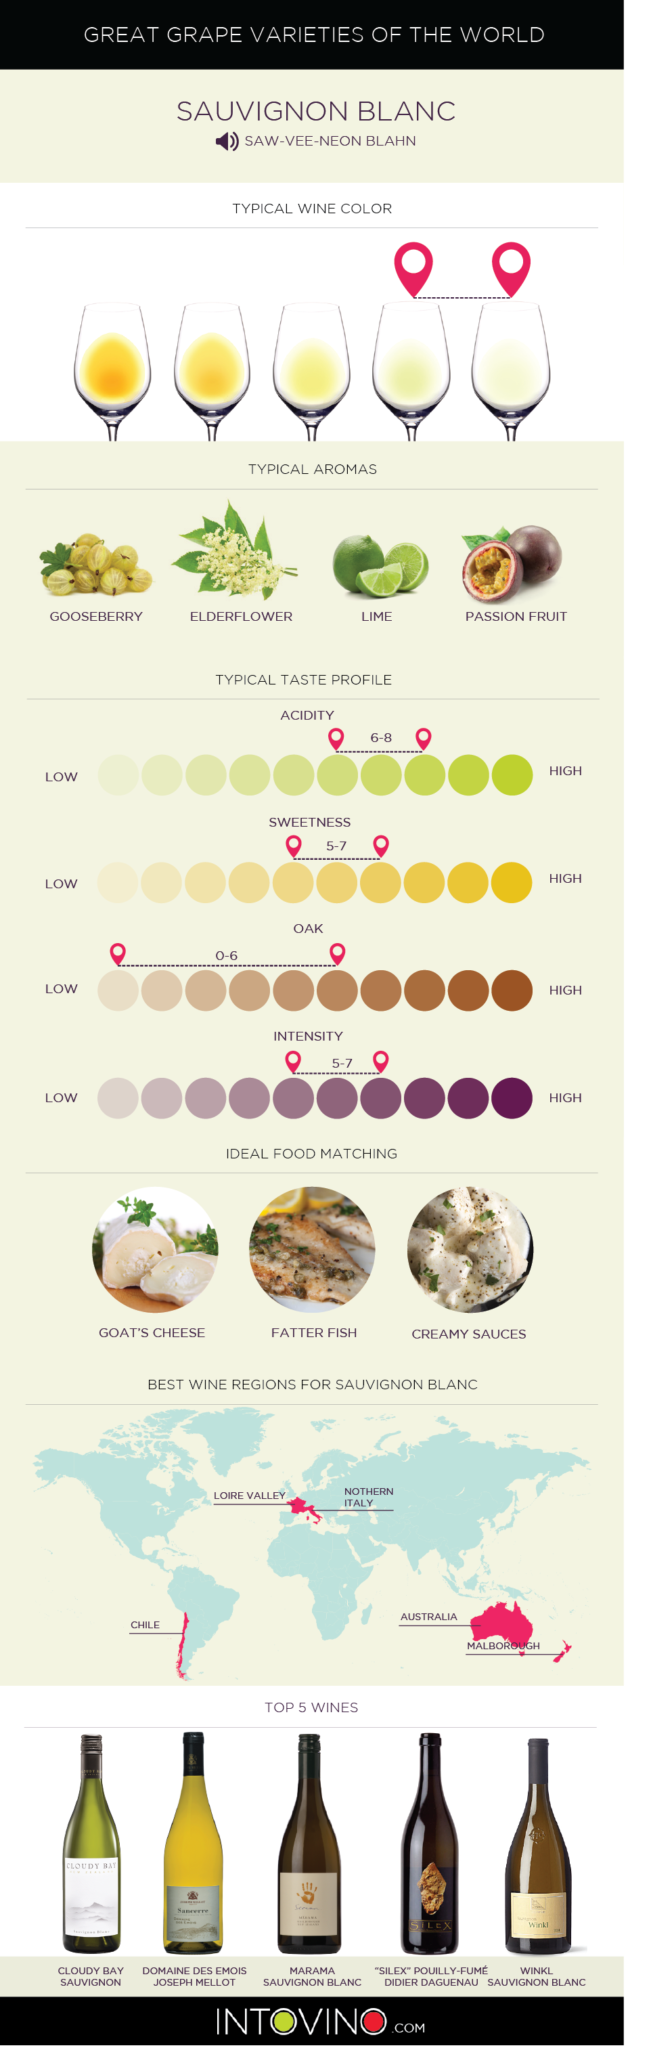 Guide to Sauvignon Blanc